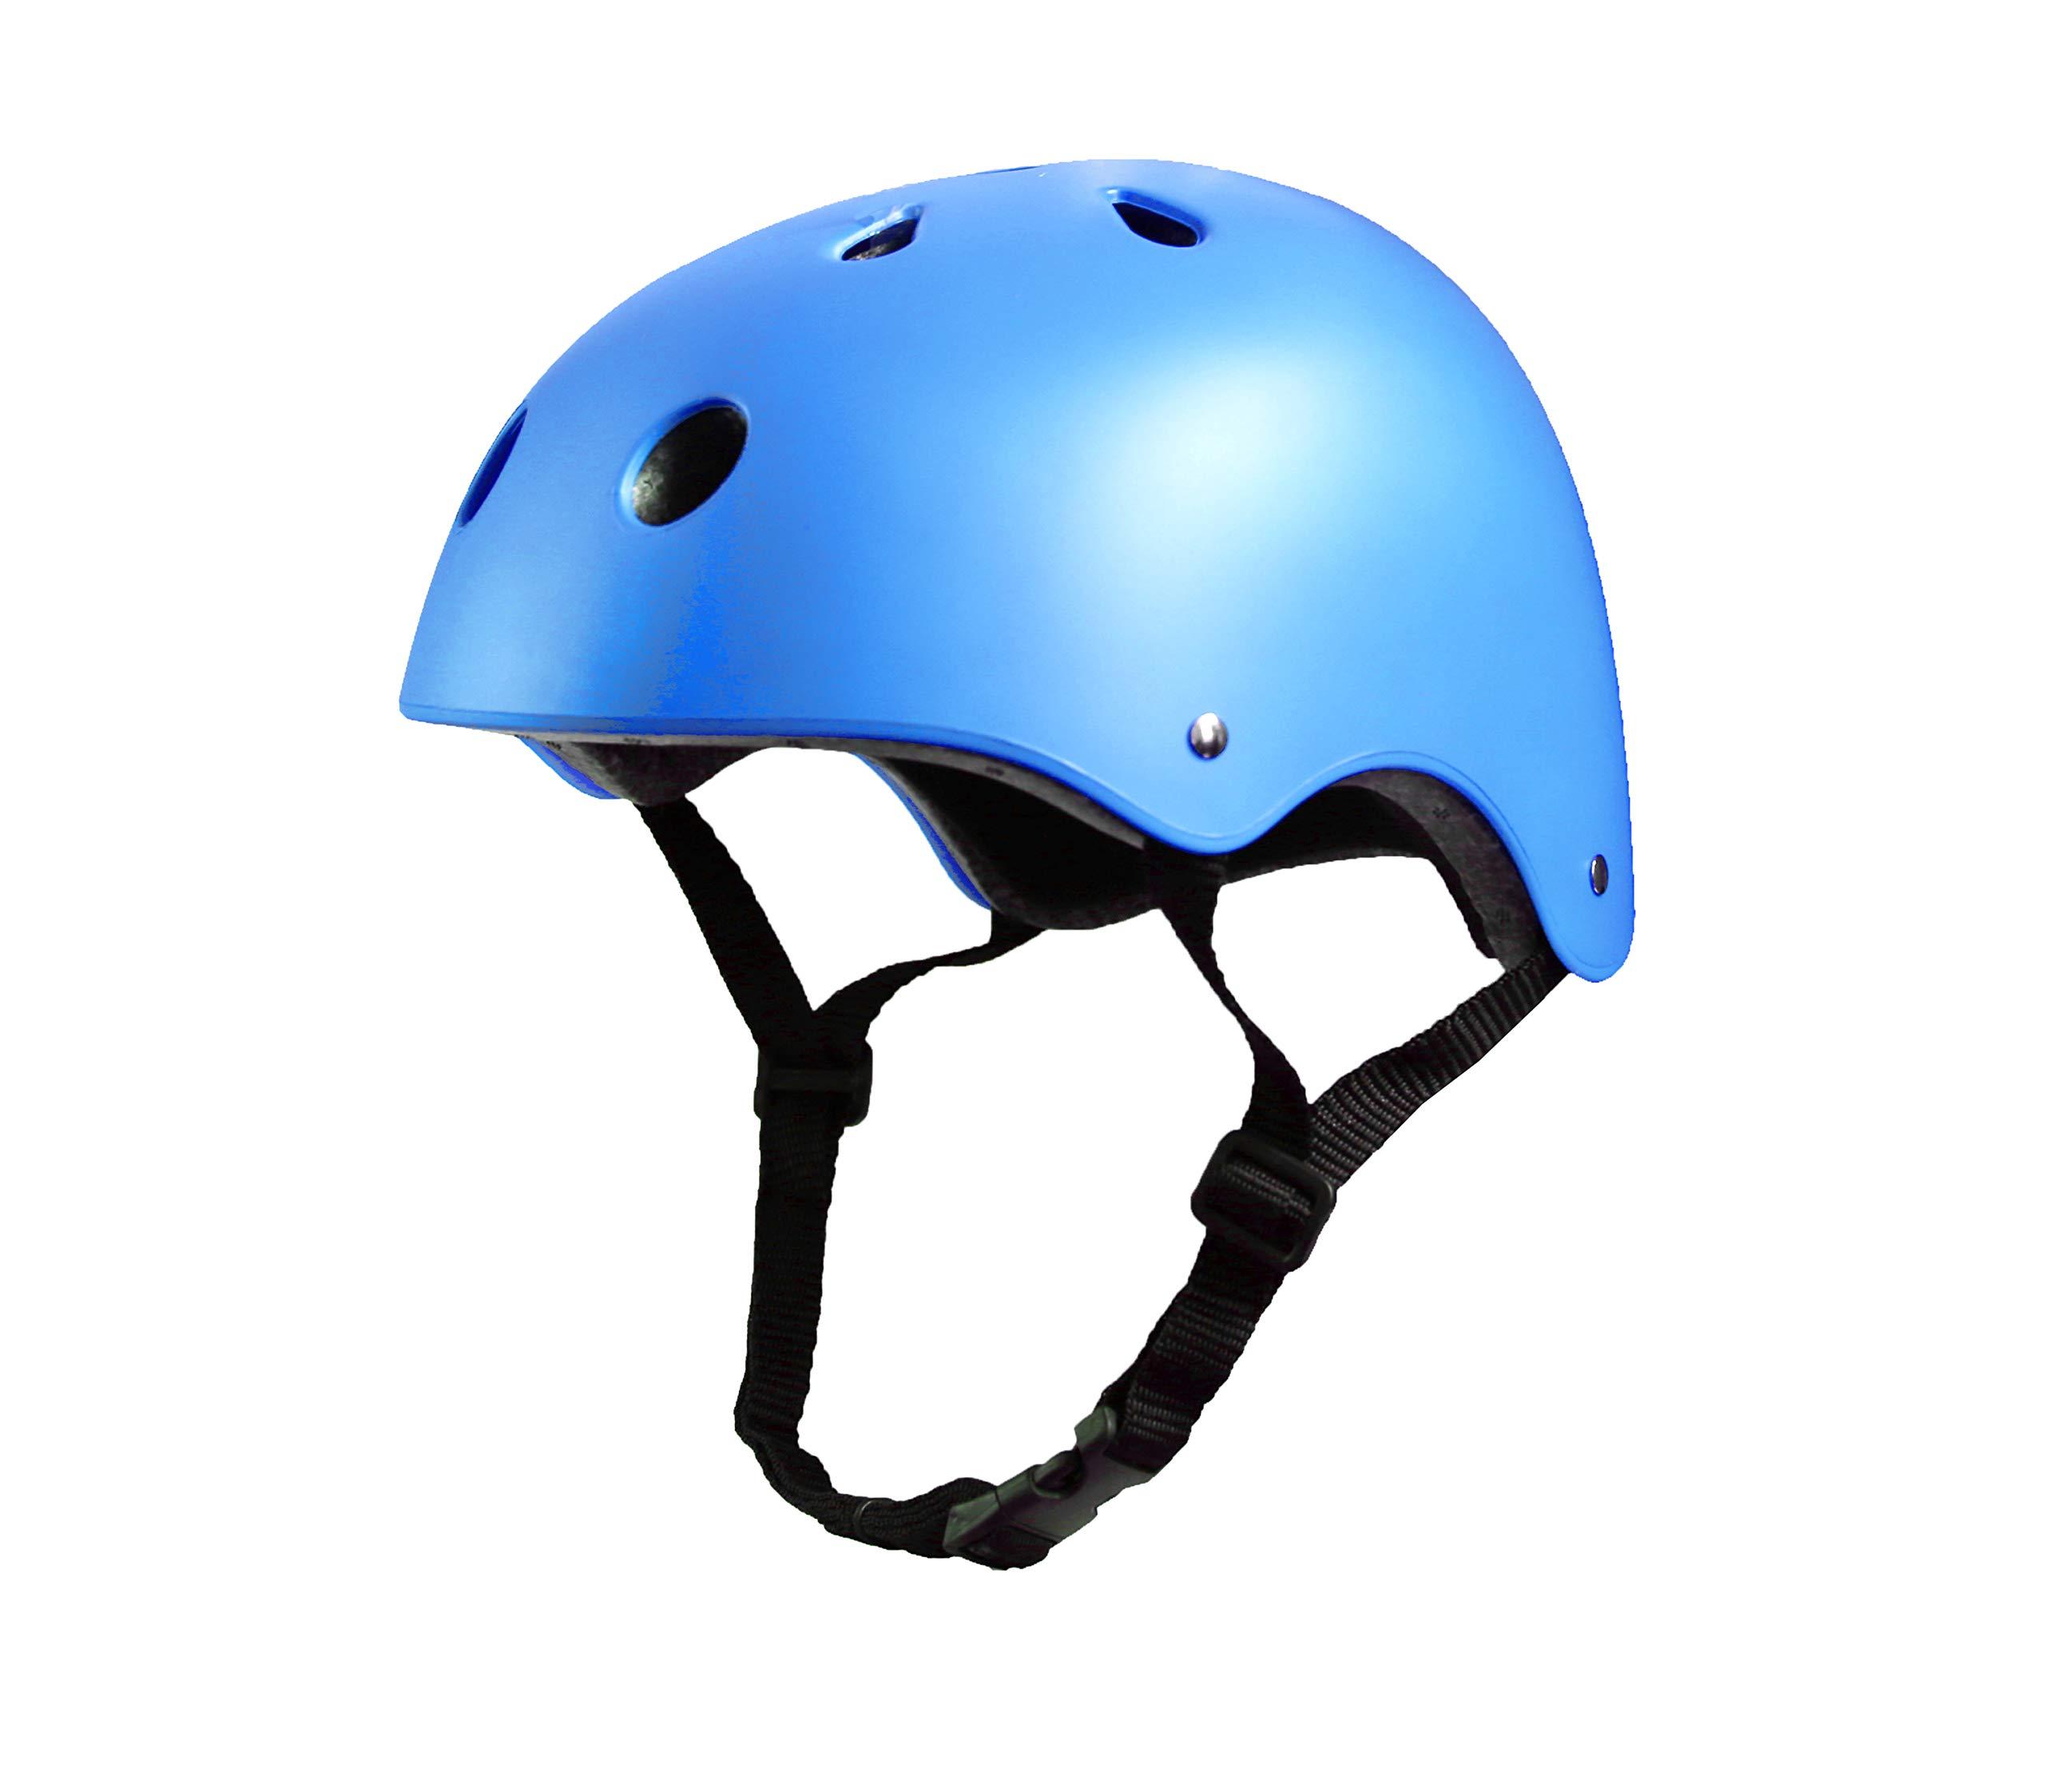 Tourdarson Adult Skateboard Helmet Specialized Certified Protection Multi-Sports for Scooter Skate Skateboarding BMX (Blue, Large)